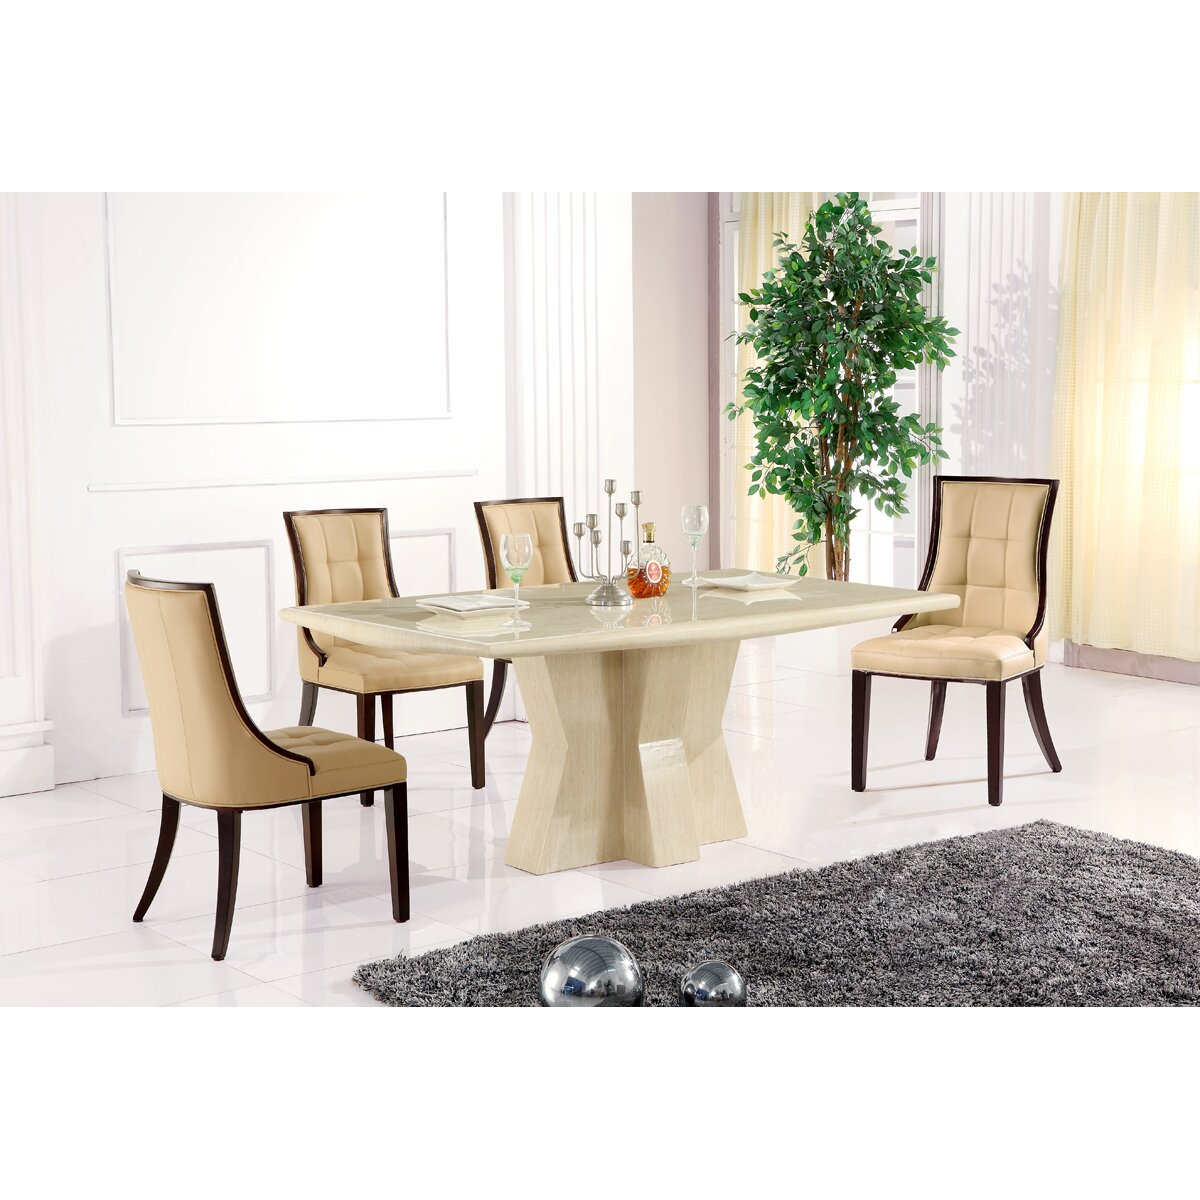 Homestead Living Dining Table Wayfair Uk